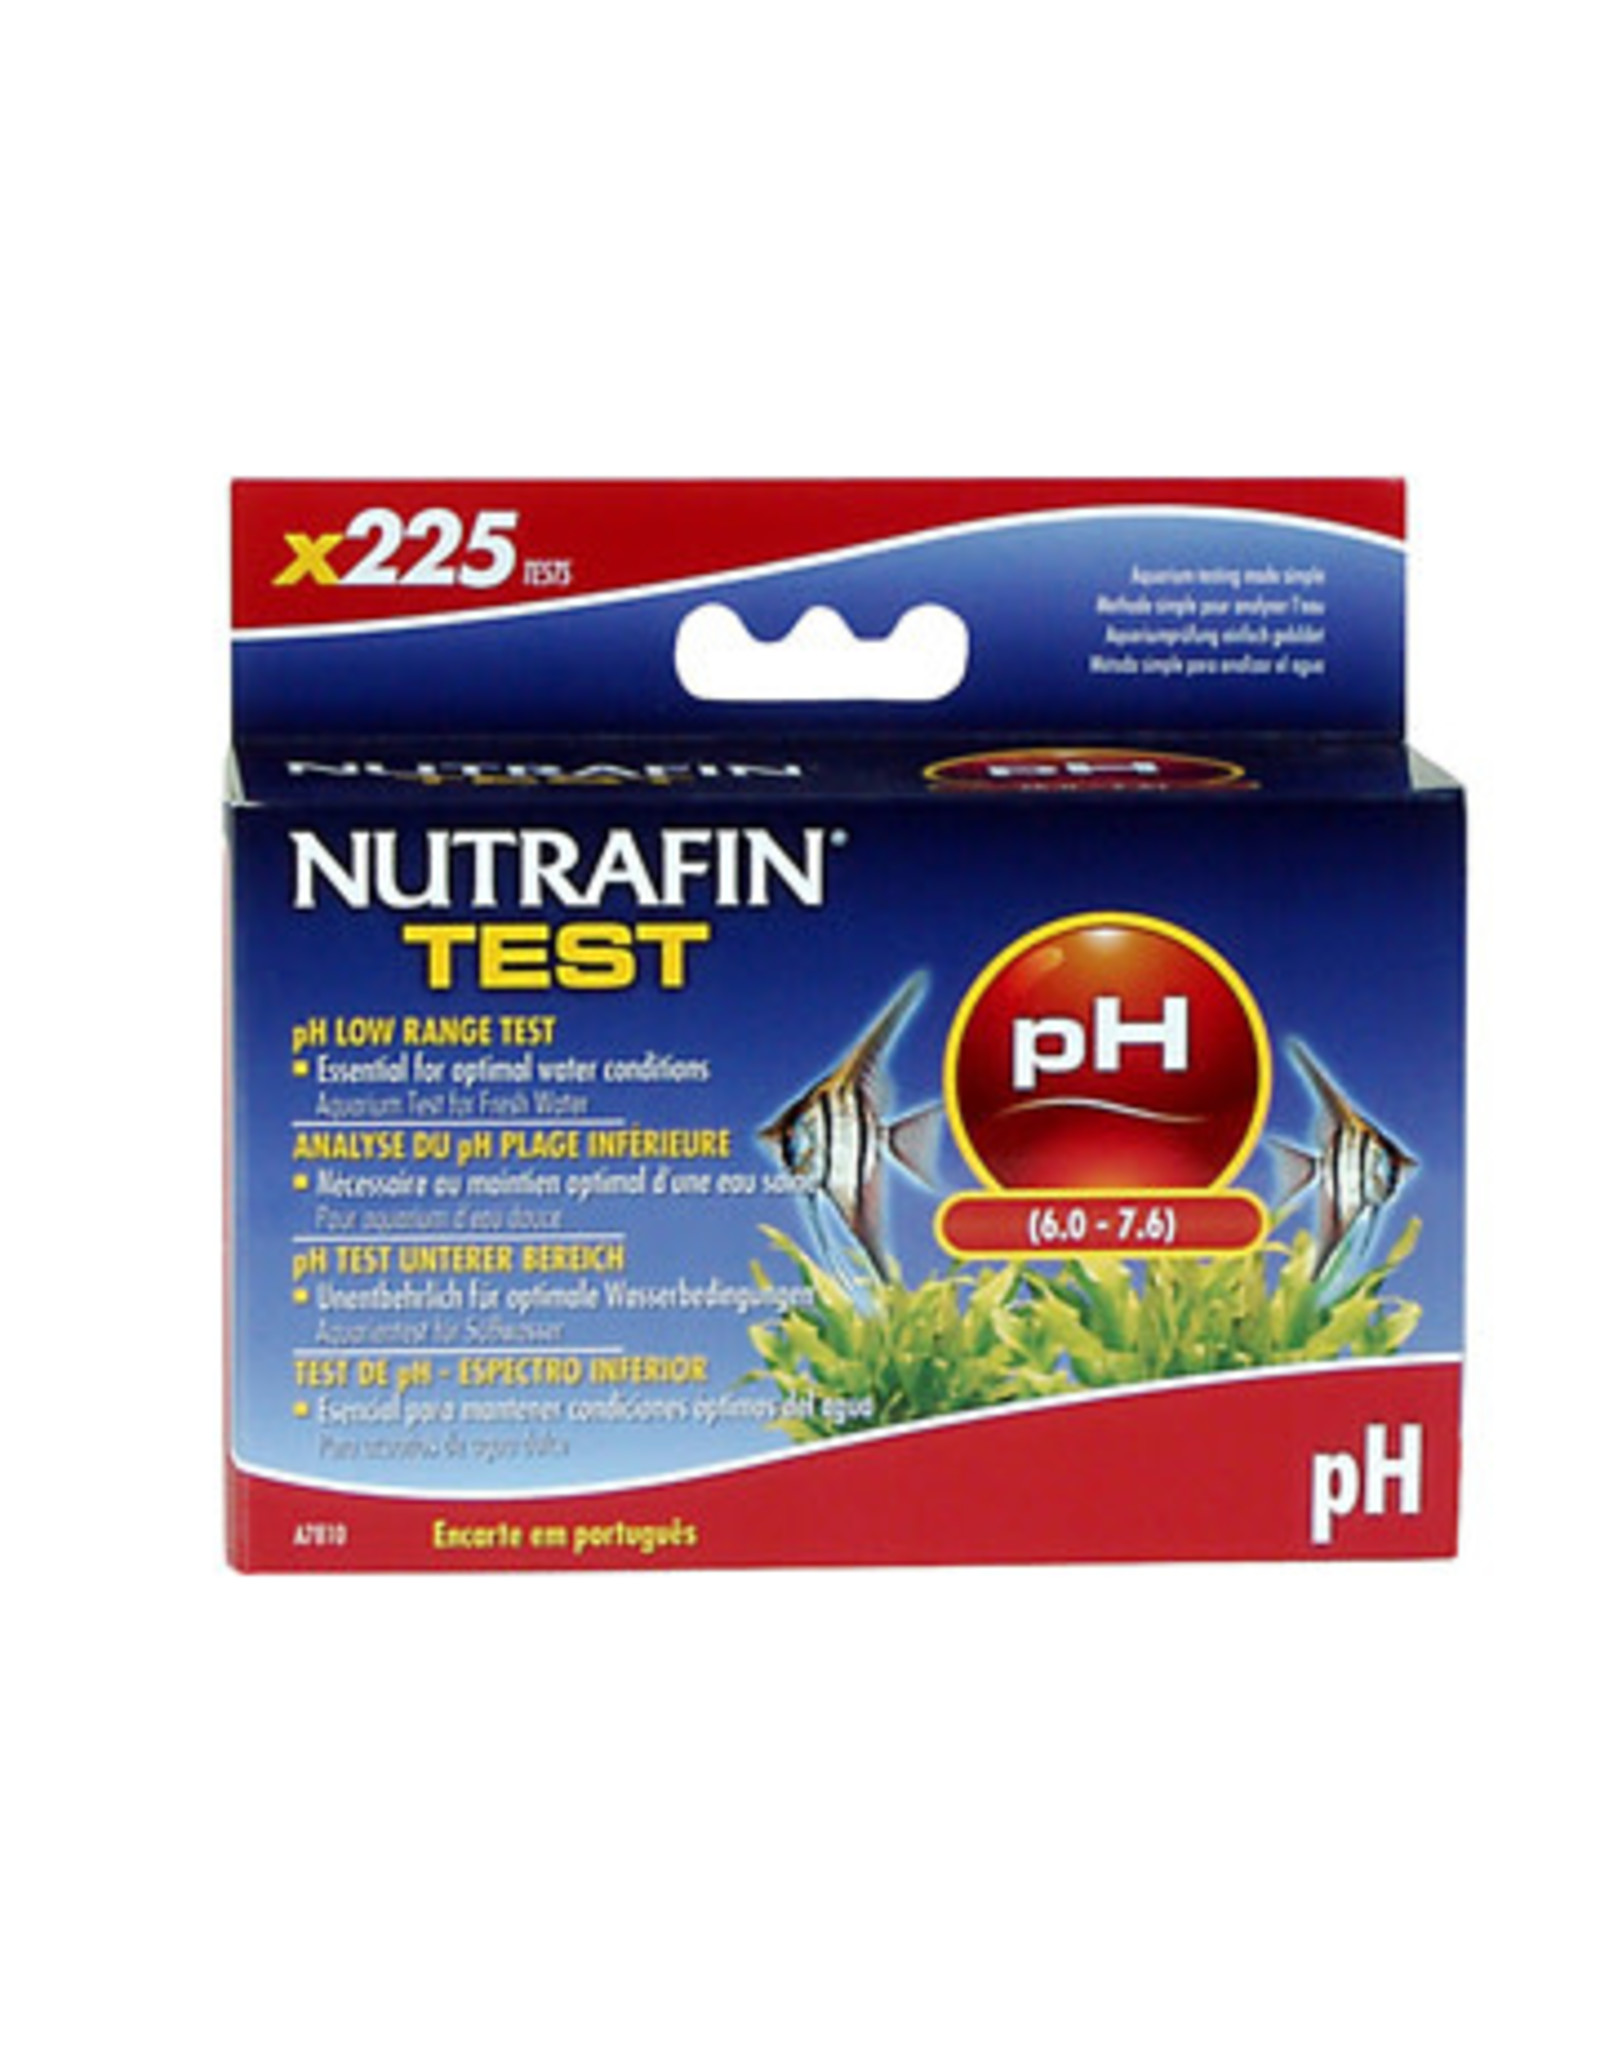 Nutrafin Nutrafin pH Low Range Test (6.0 - 7.6)